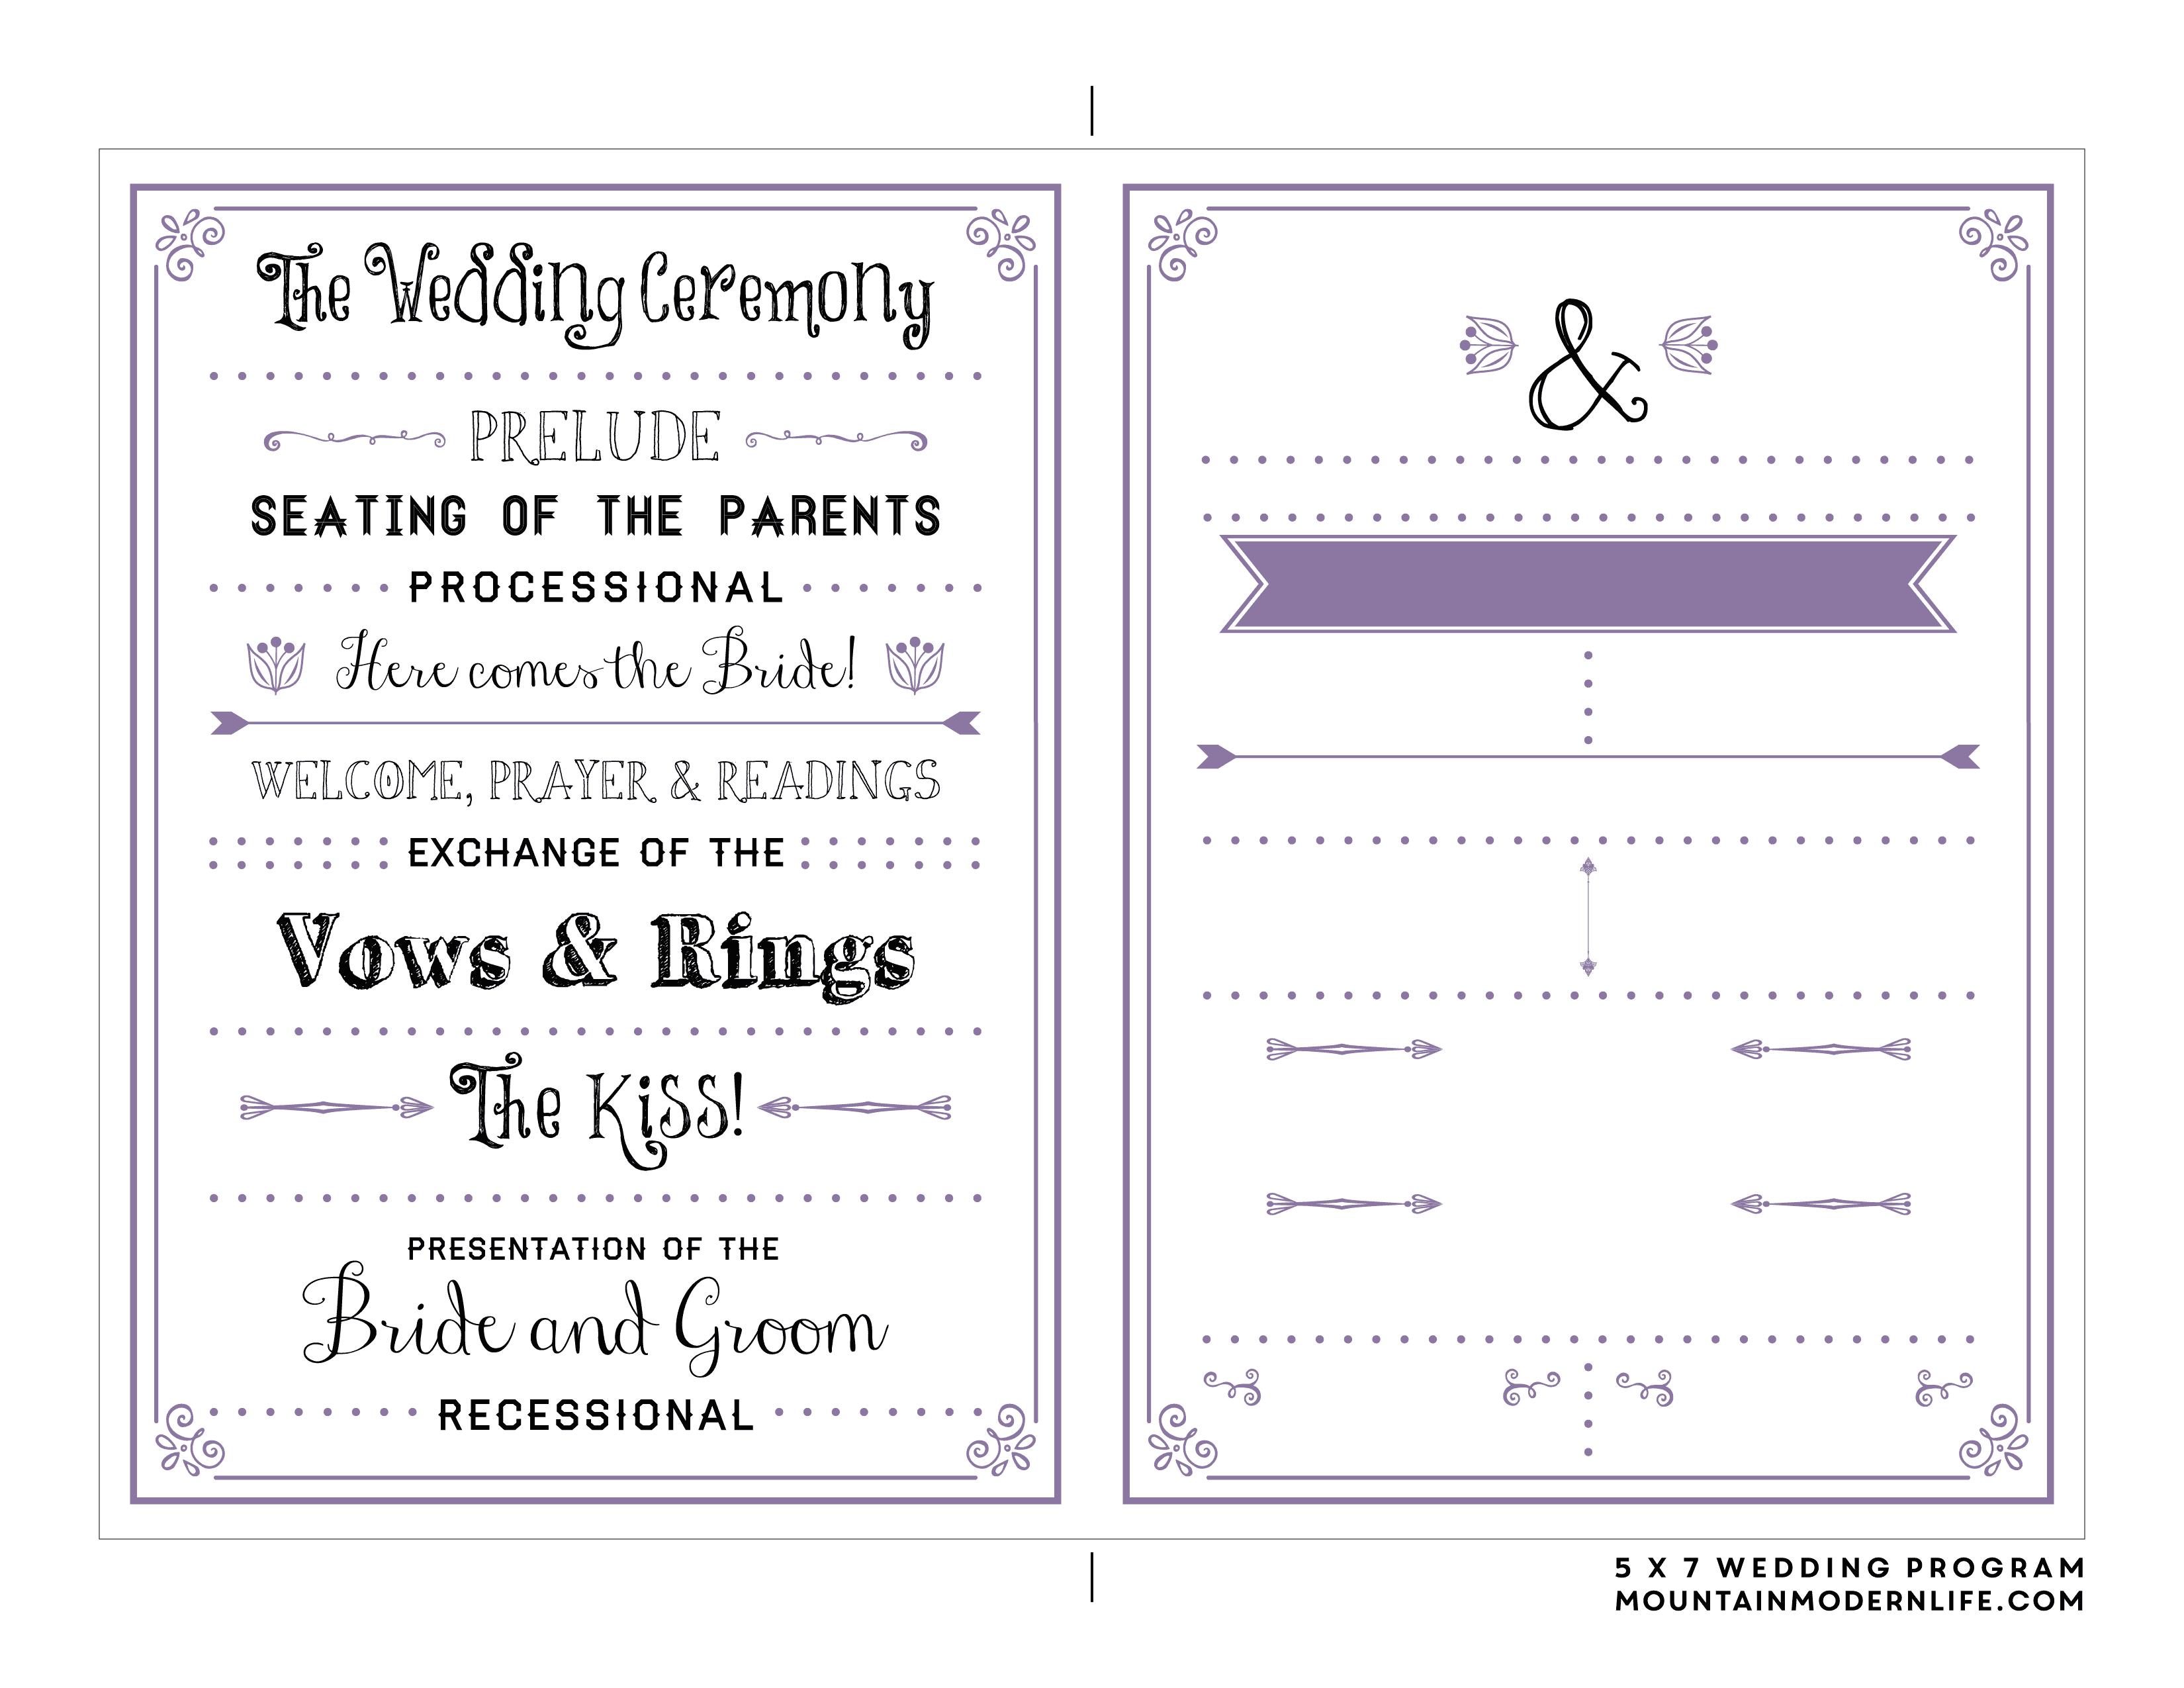 Free Printable Wedding Program | Mountainmodernlife - Free Printable Wedding Program Samples